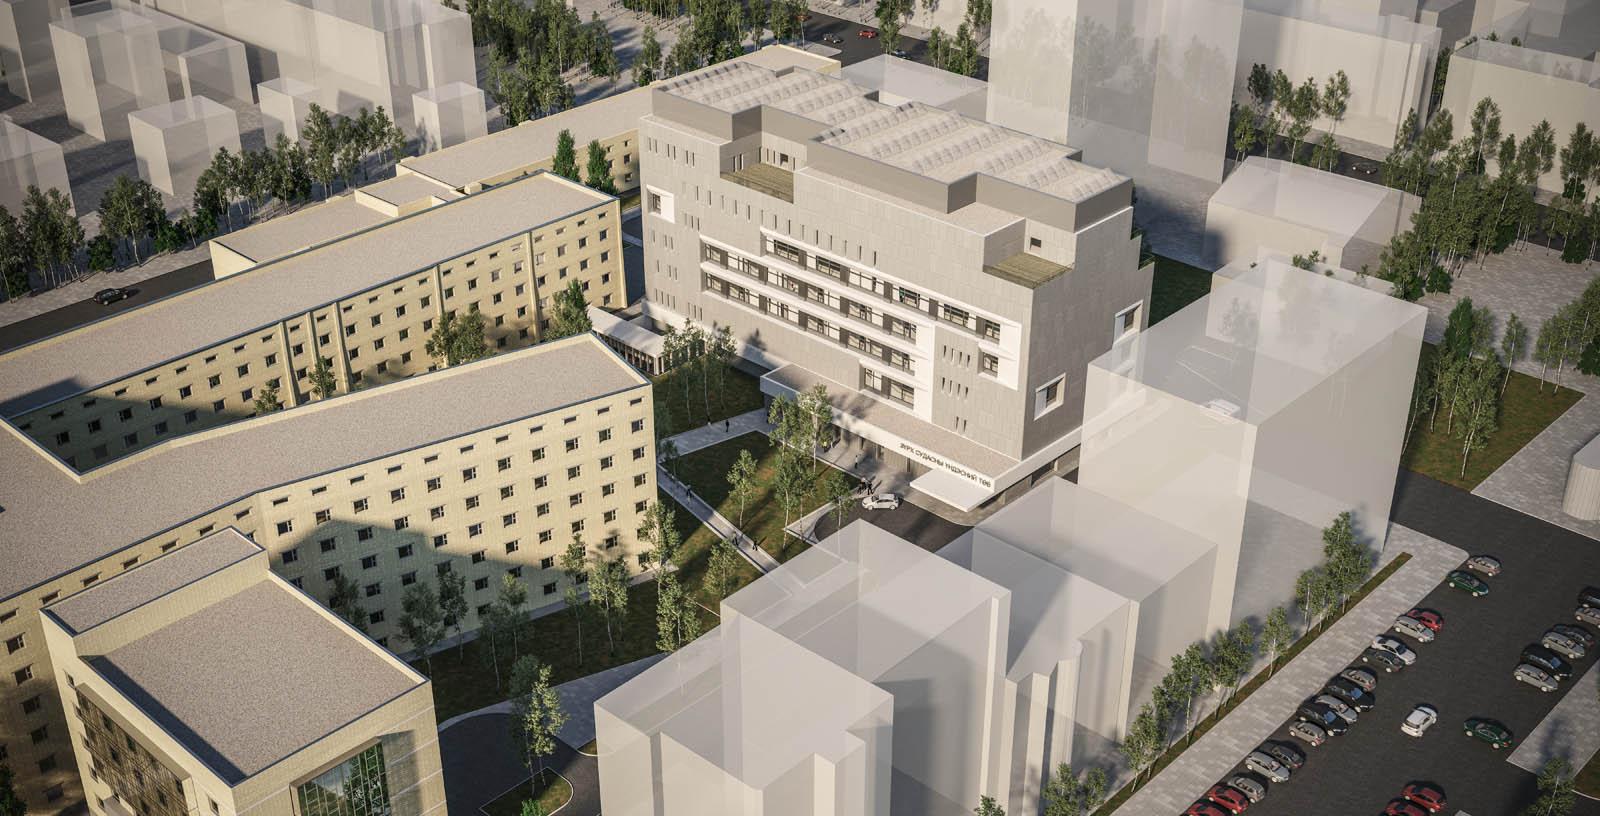 Mongolia_Hospital_3_Architecture_IDOM_1